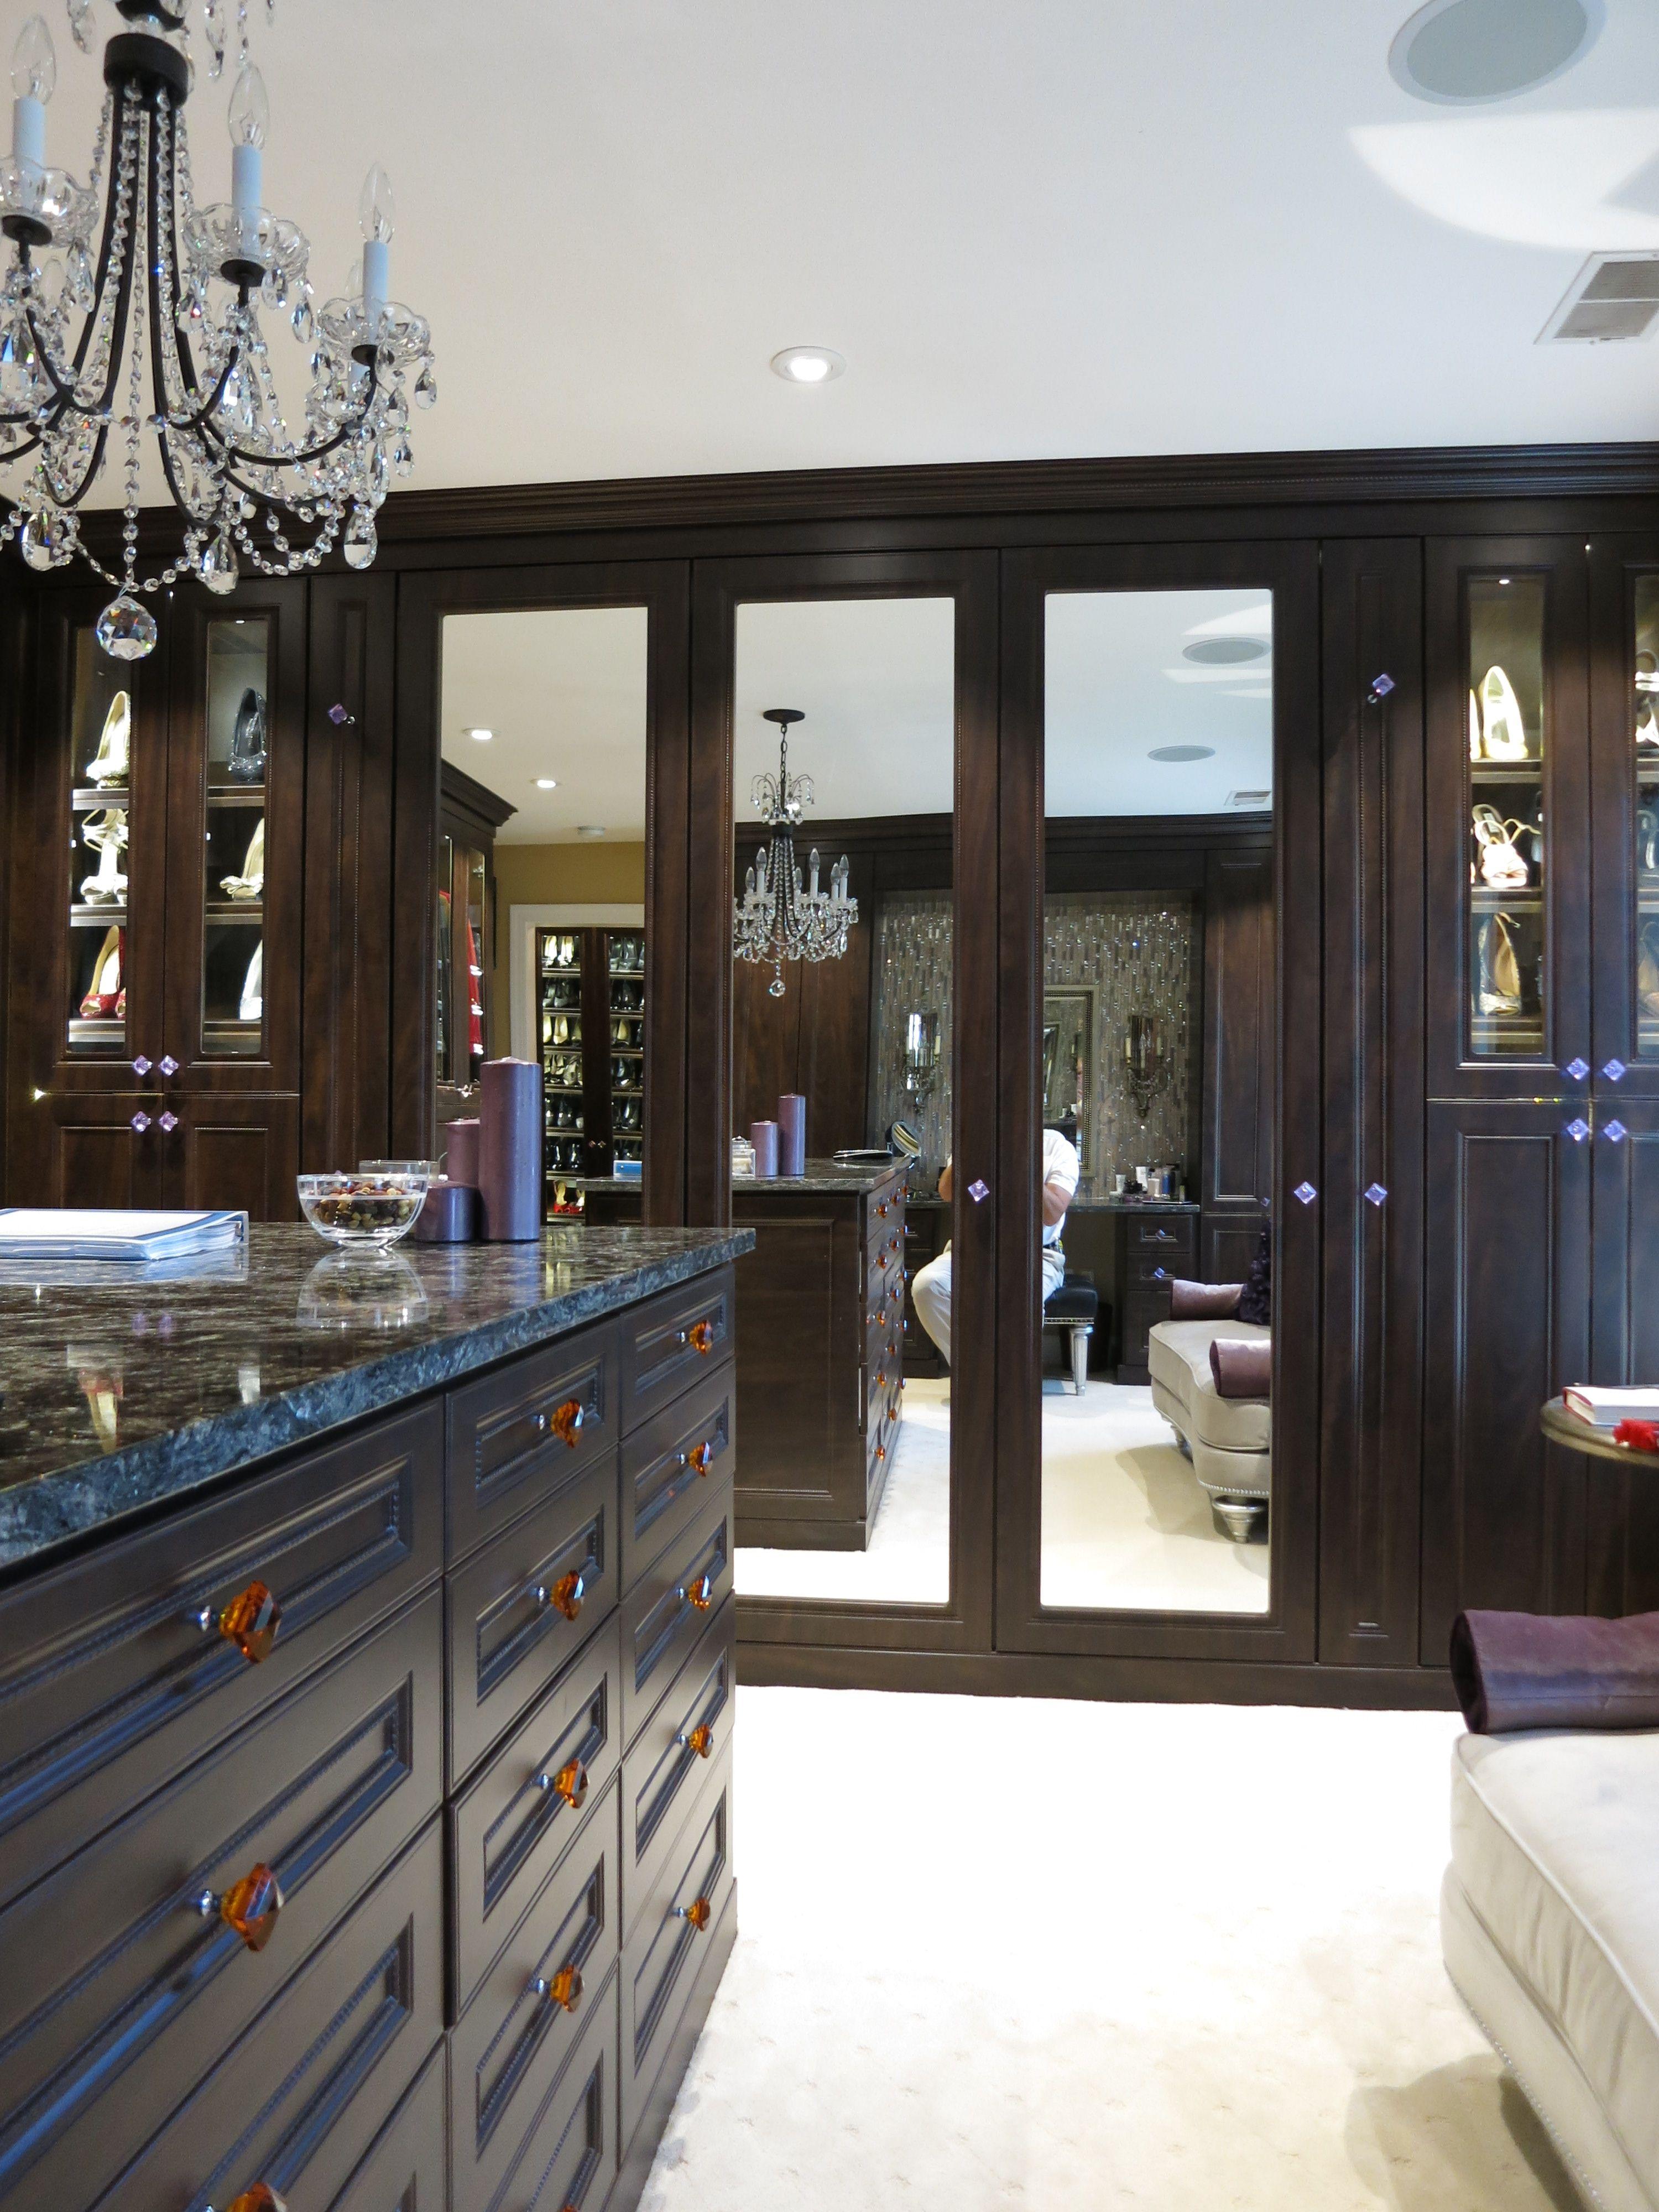 Ordinaire Capitol Closet Design Tysons Corner VA Showroom 1934 Old Gallows Rd Vienna,  VA 22182 703